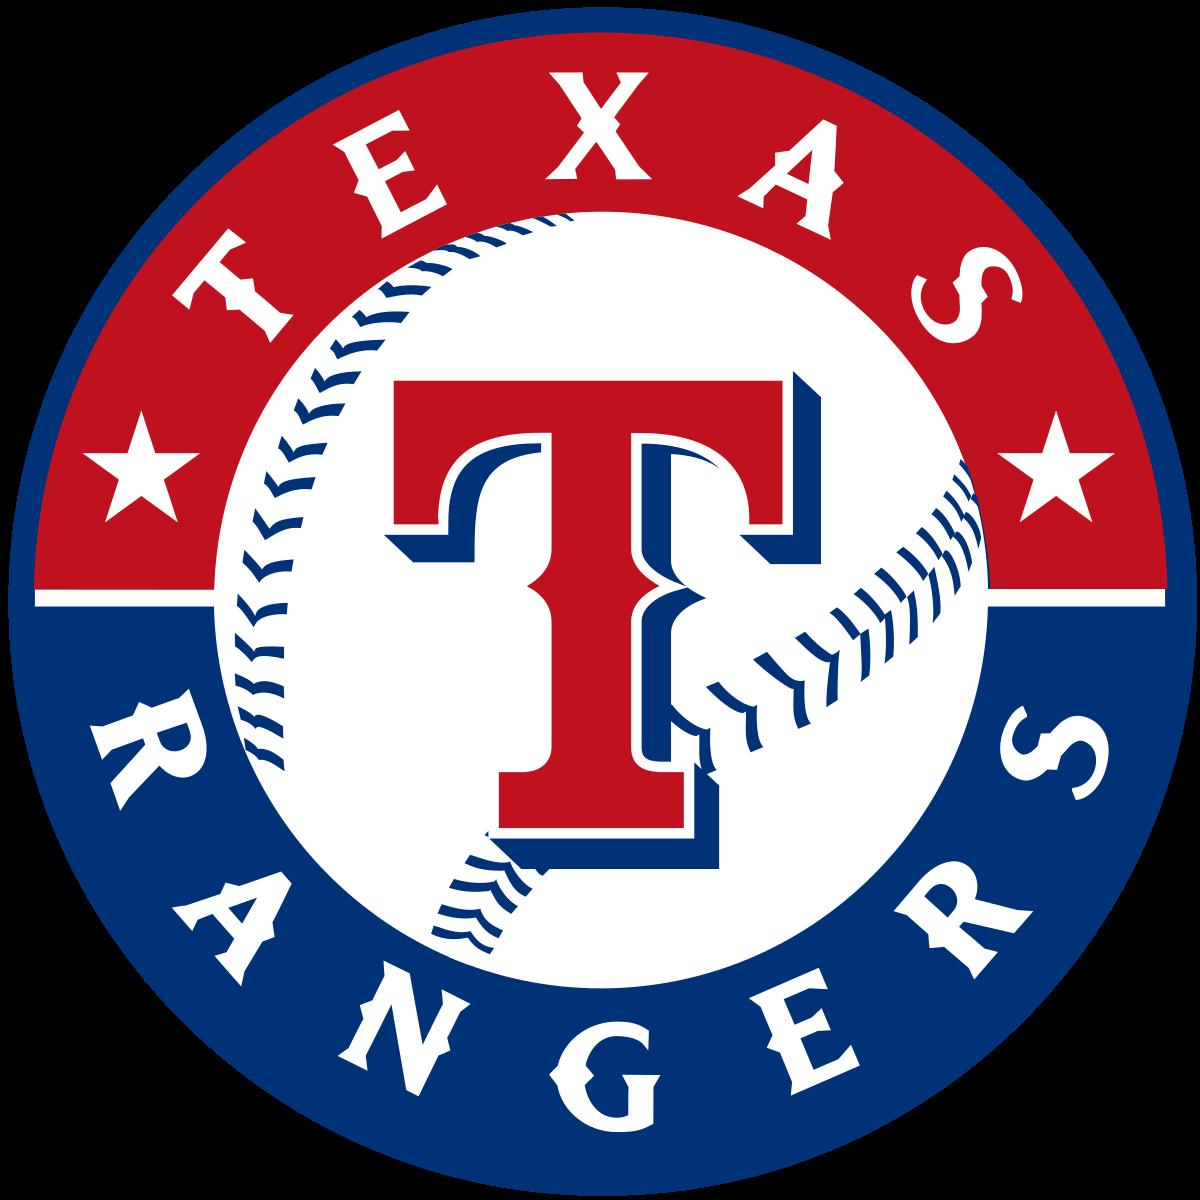 Texas rangers baseball wikipedia. Professional clipart professional team